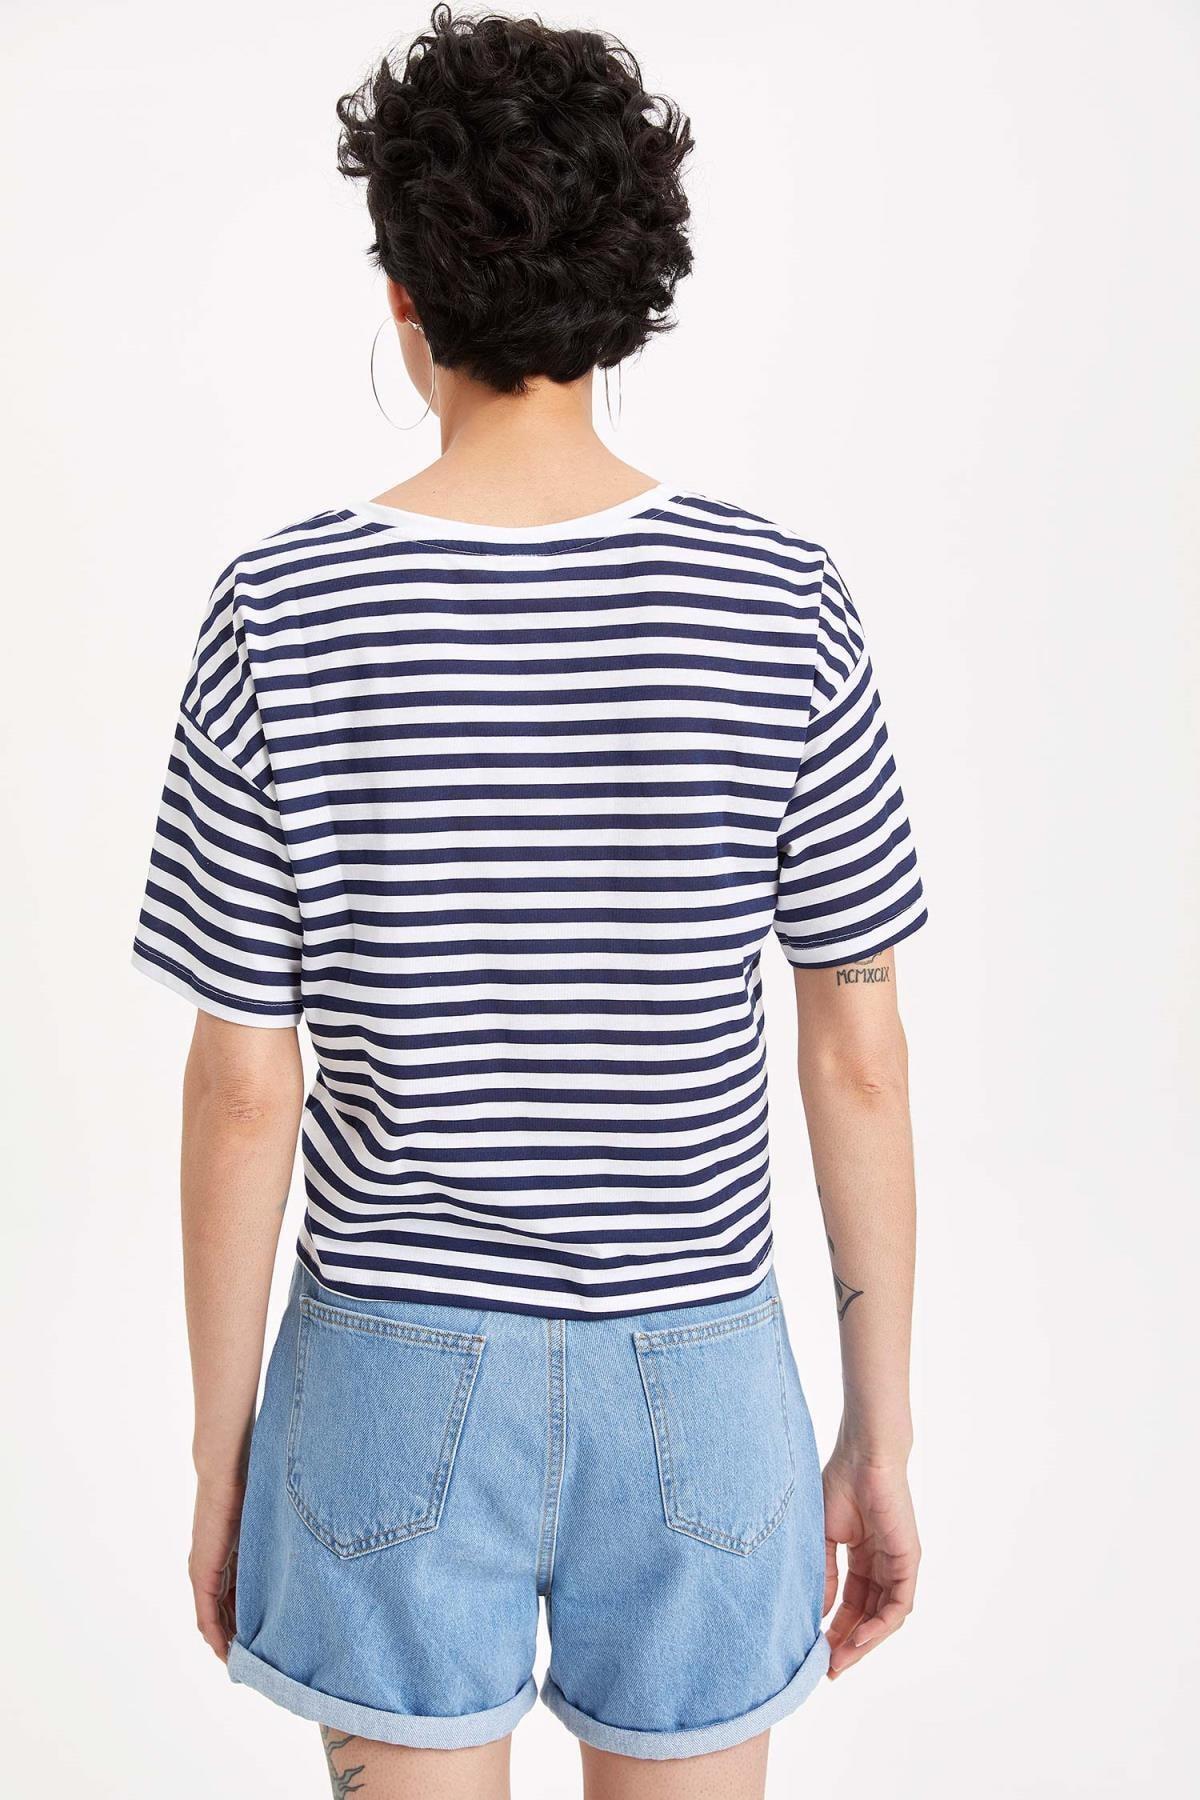 Defacto Kadın Çivit Mavisi Warner Bros Lisanslı Relax Fit T-shirt K9038AZ.19SM.IN95 3